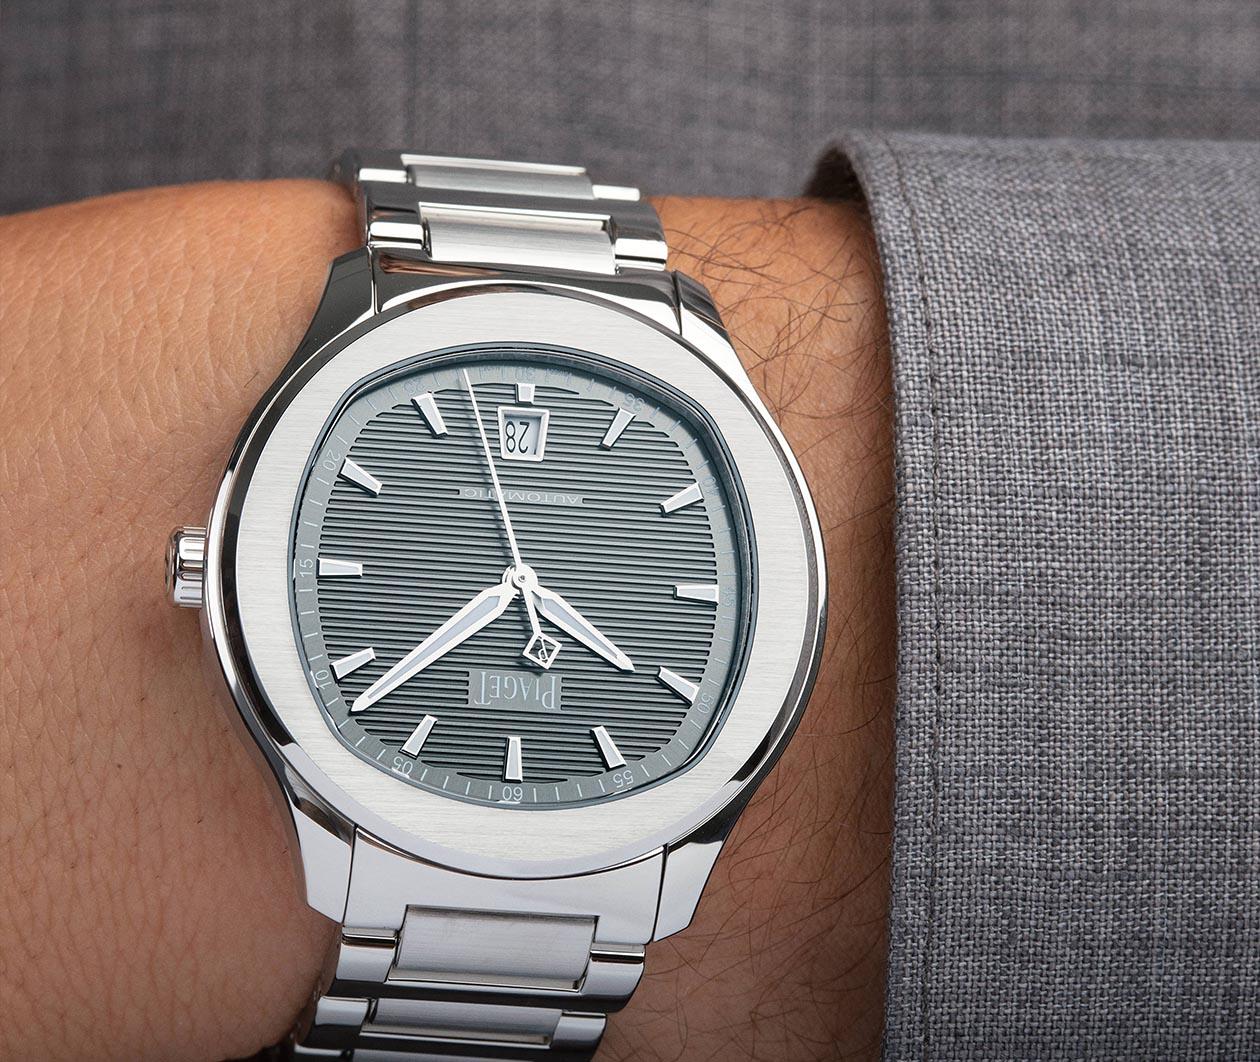 Piaget PoloS watch G0A41003 Carousel 2 FINAL